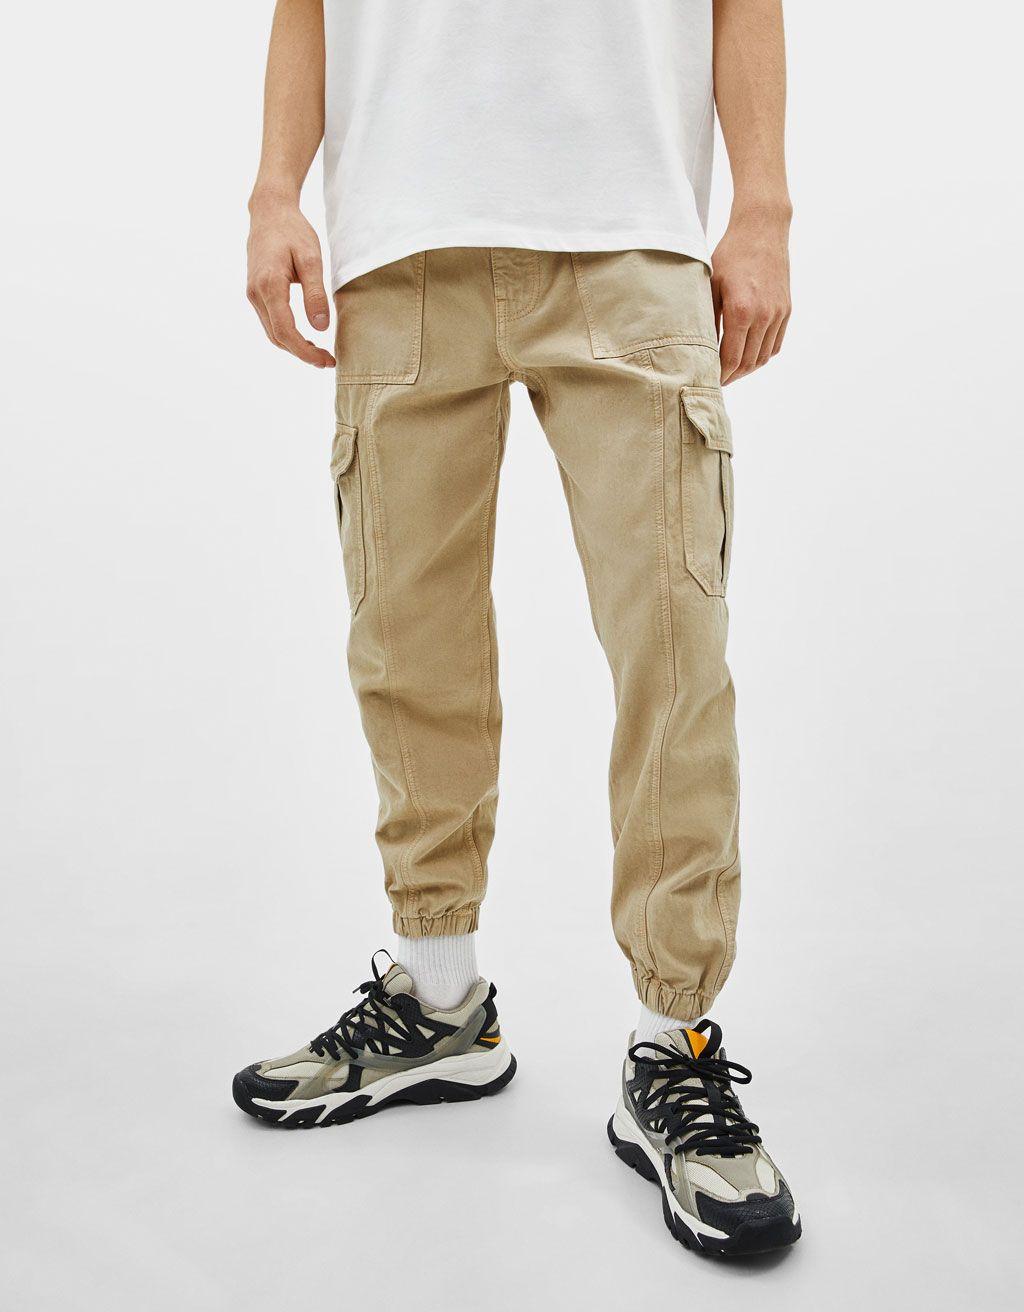 Pantalon Cargo Jogger Camuflaje Pantalones Bershka Espana Denim Bershka Pantalones Bershka Pantalones Cargo